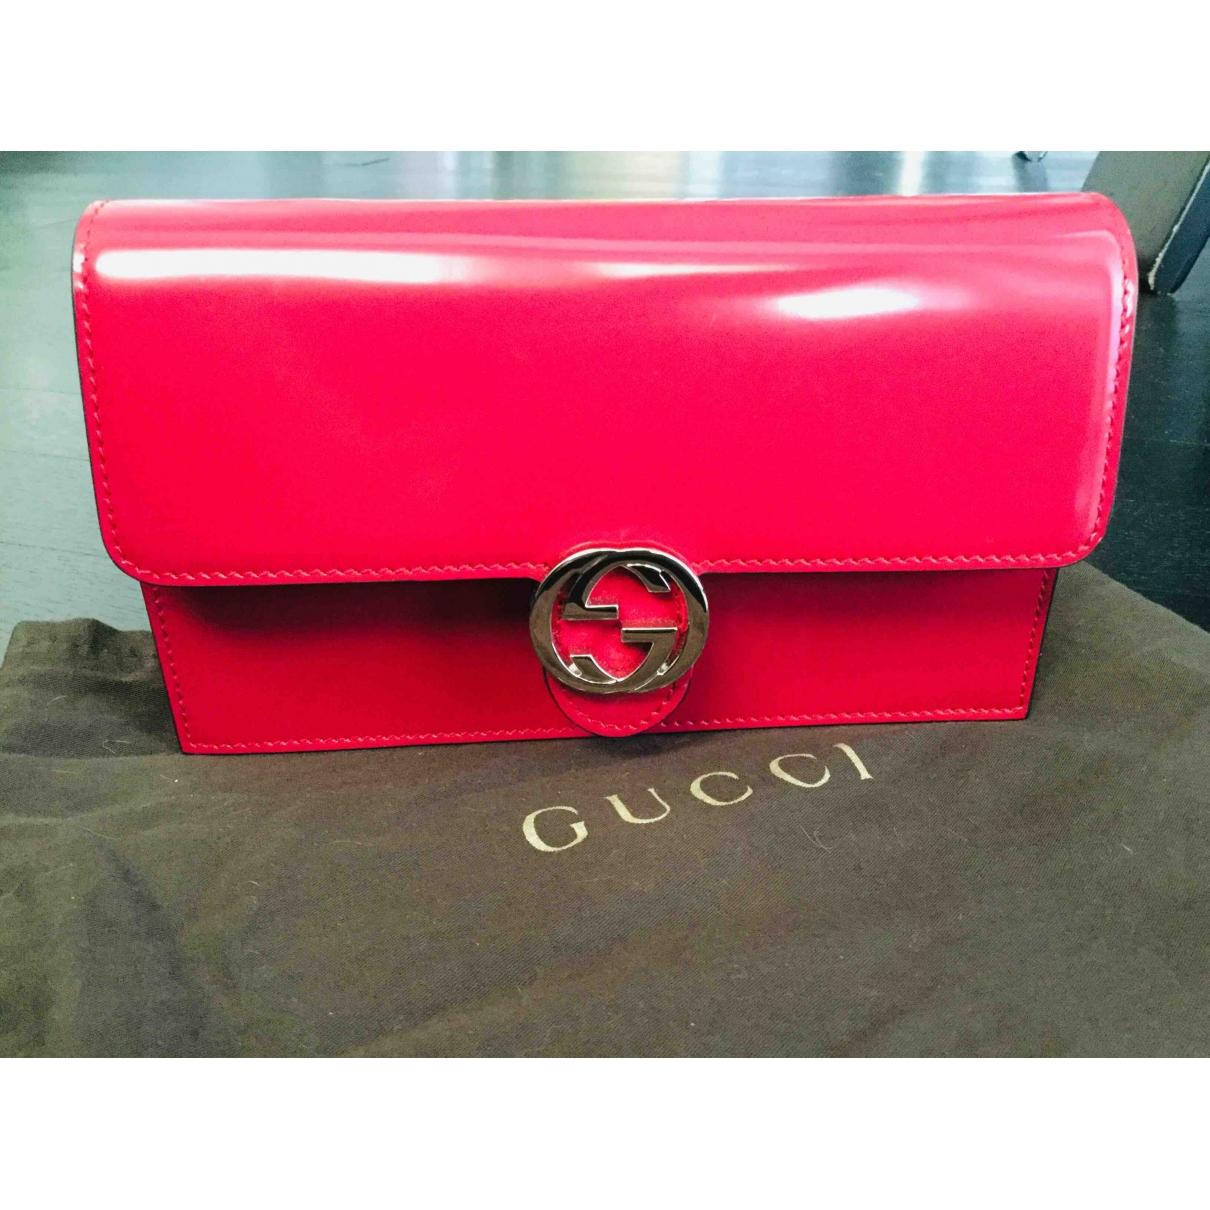 Gucci Interlocking Clutch in Leder